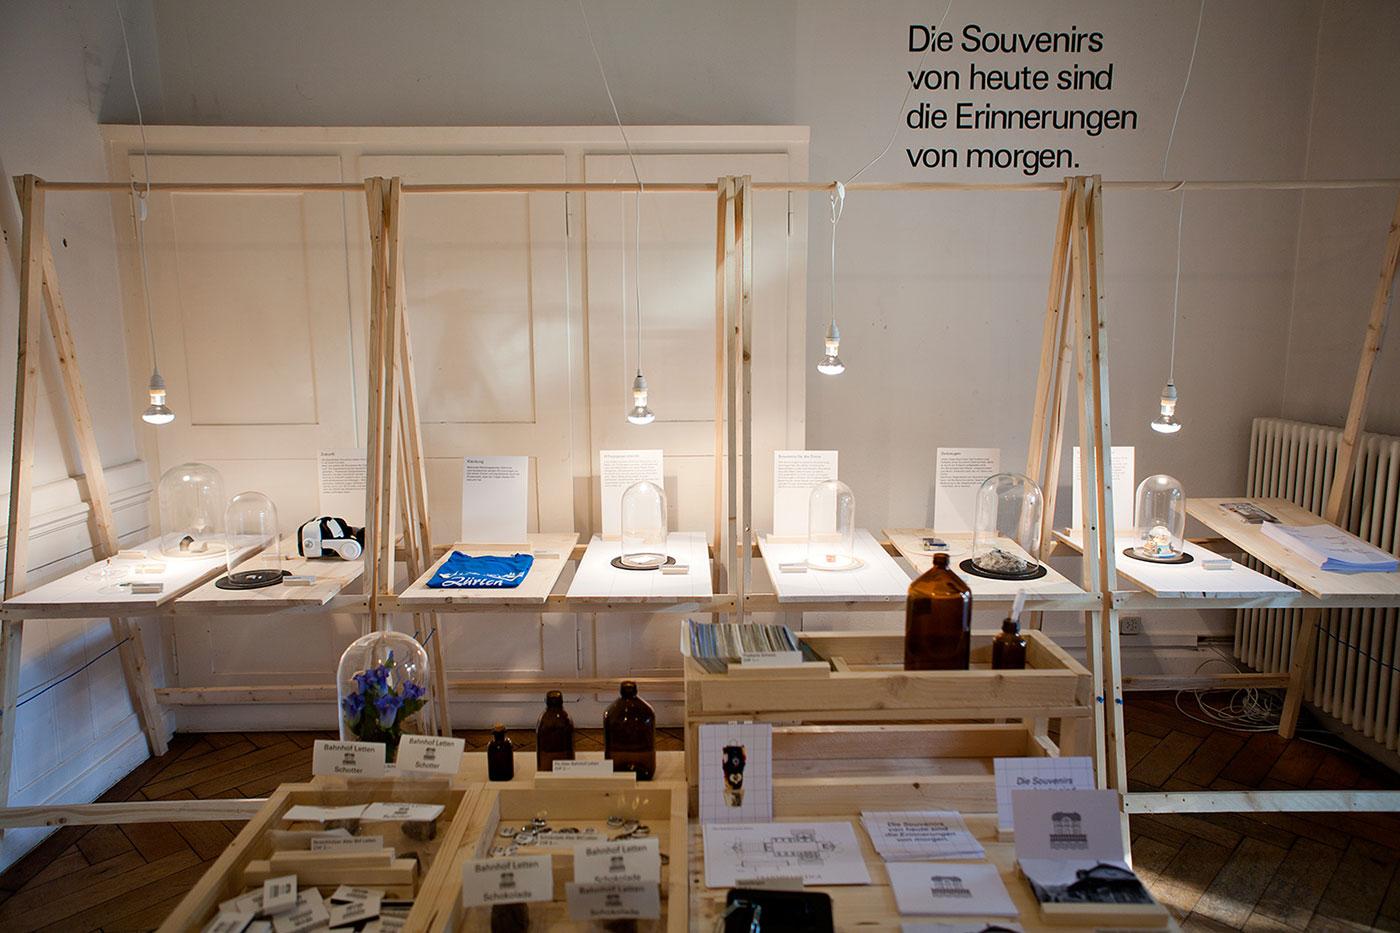 Design Biennale Zürich 2017, Souvenirs der Zukunft, Transhelvetica (Foto: Lukas Beyeler)